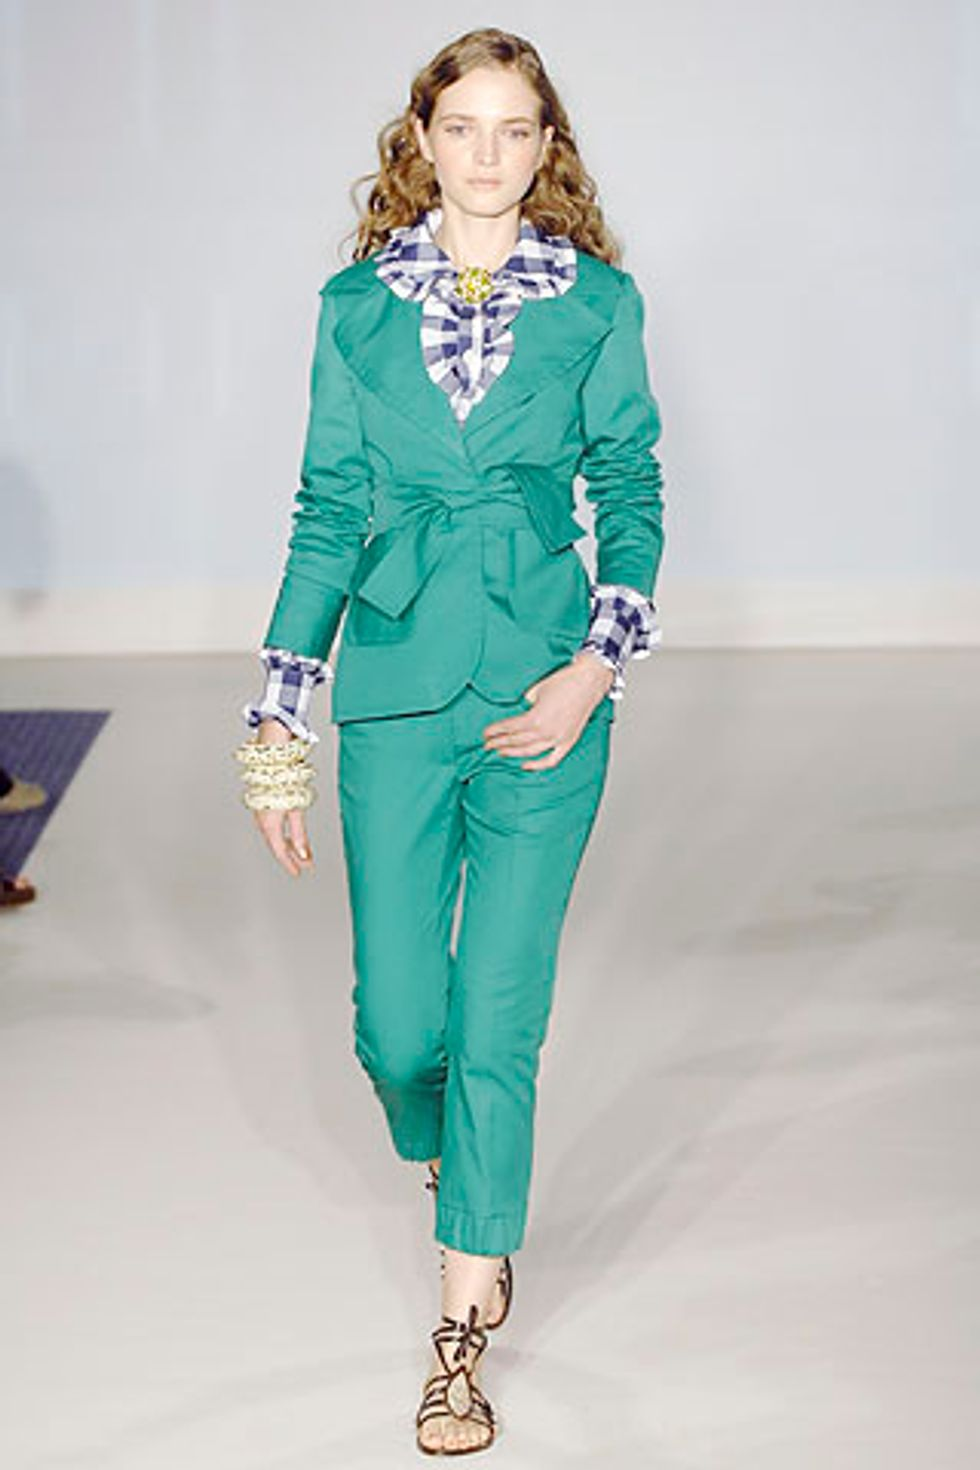 London Fashion Week: Delightful Duro Olowu